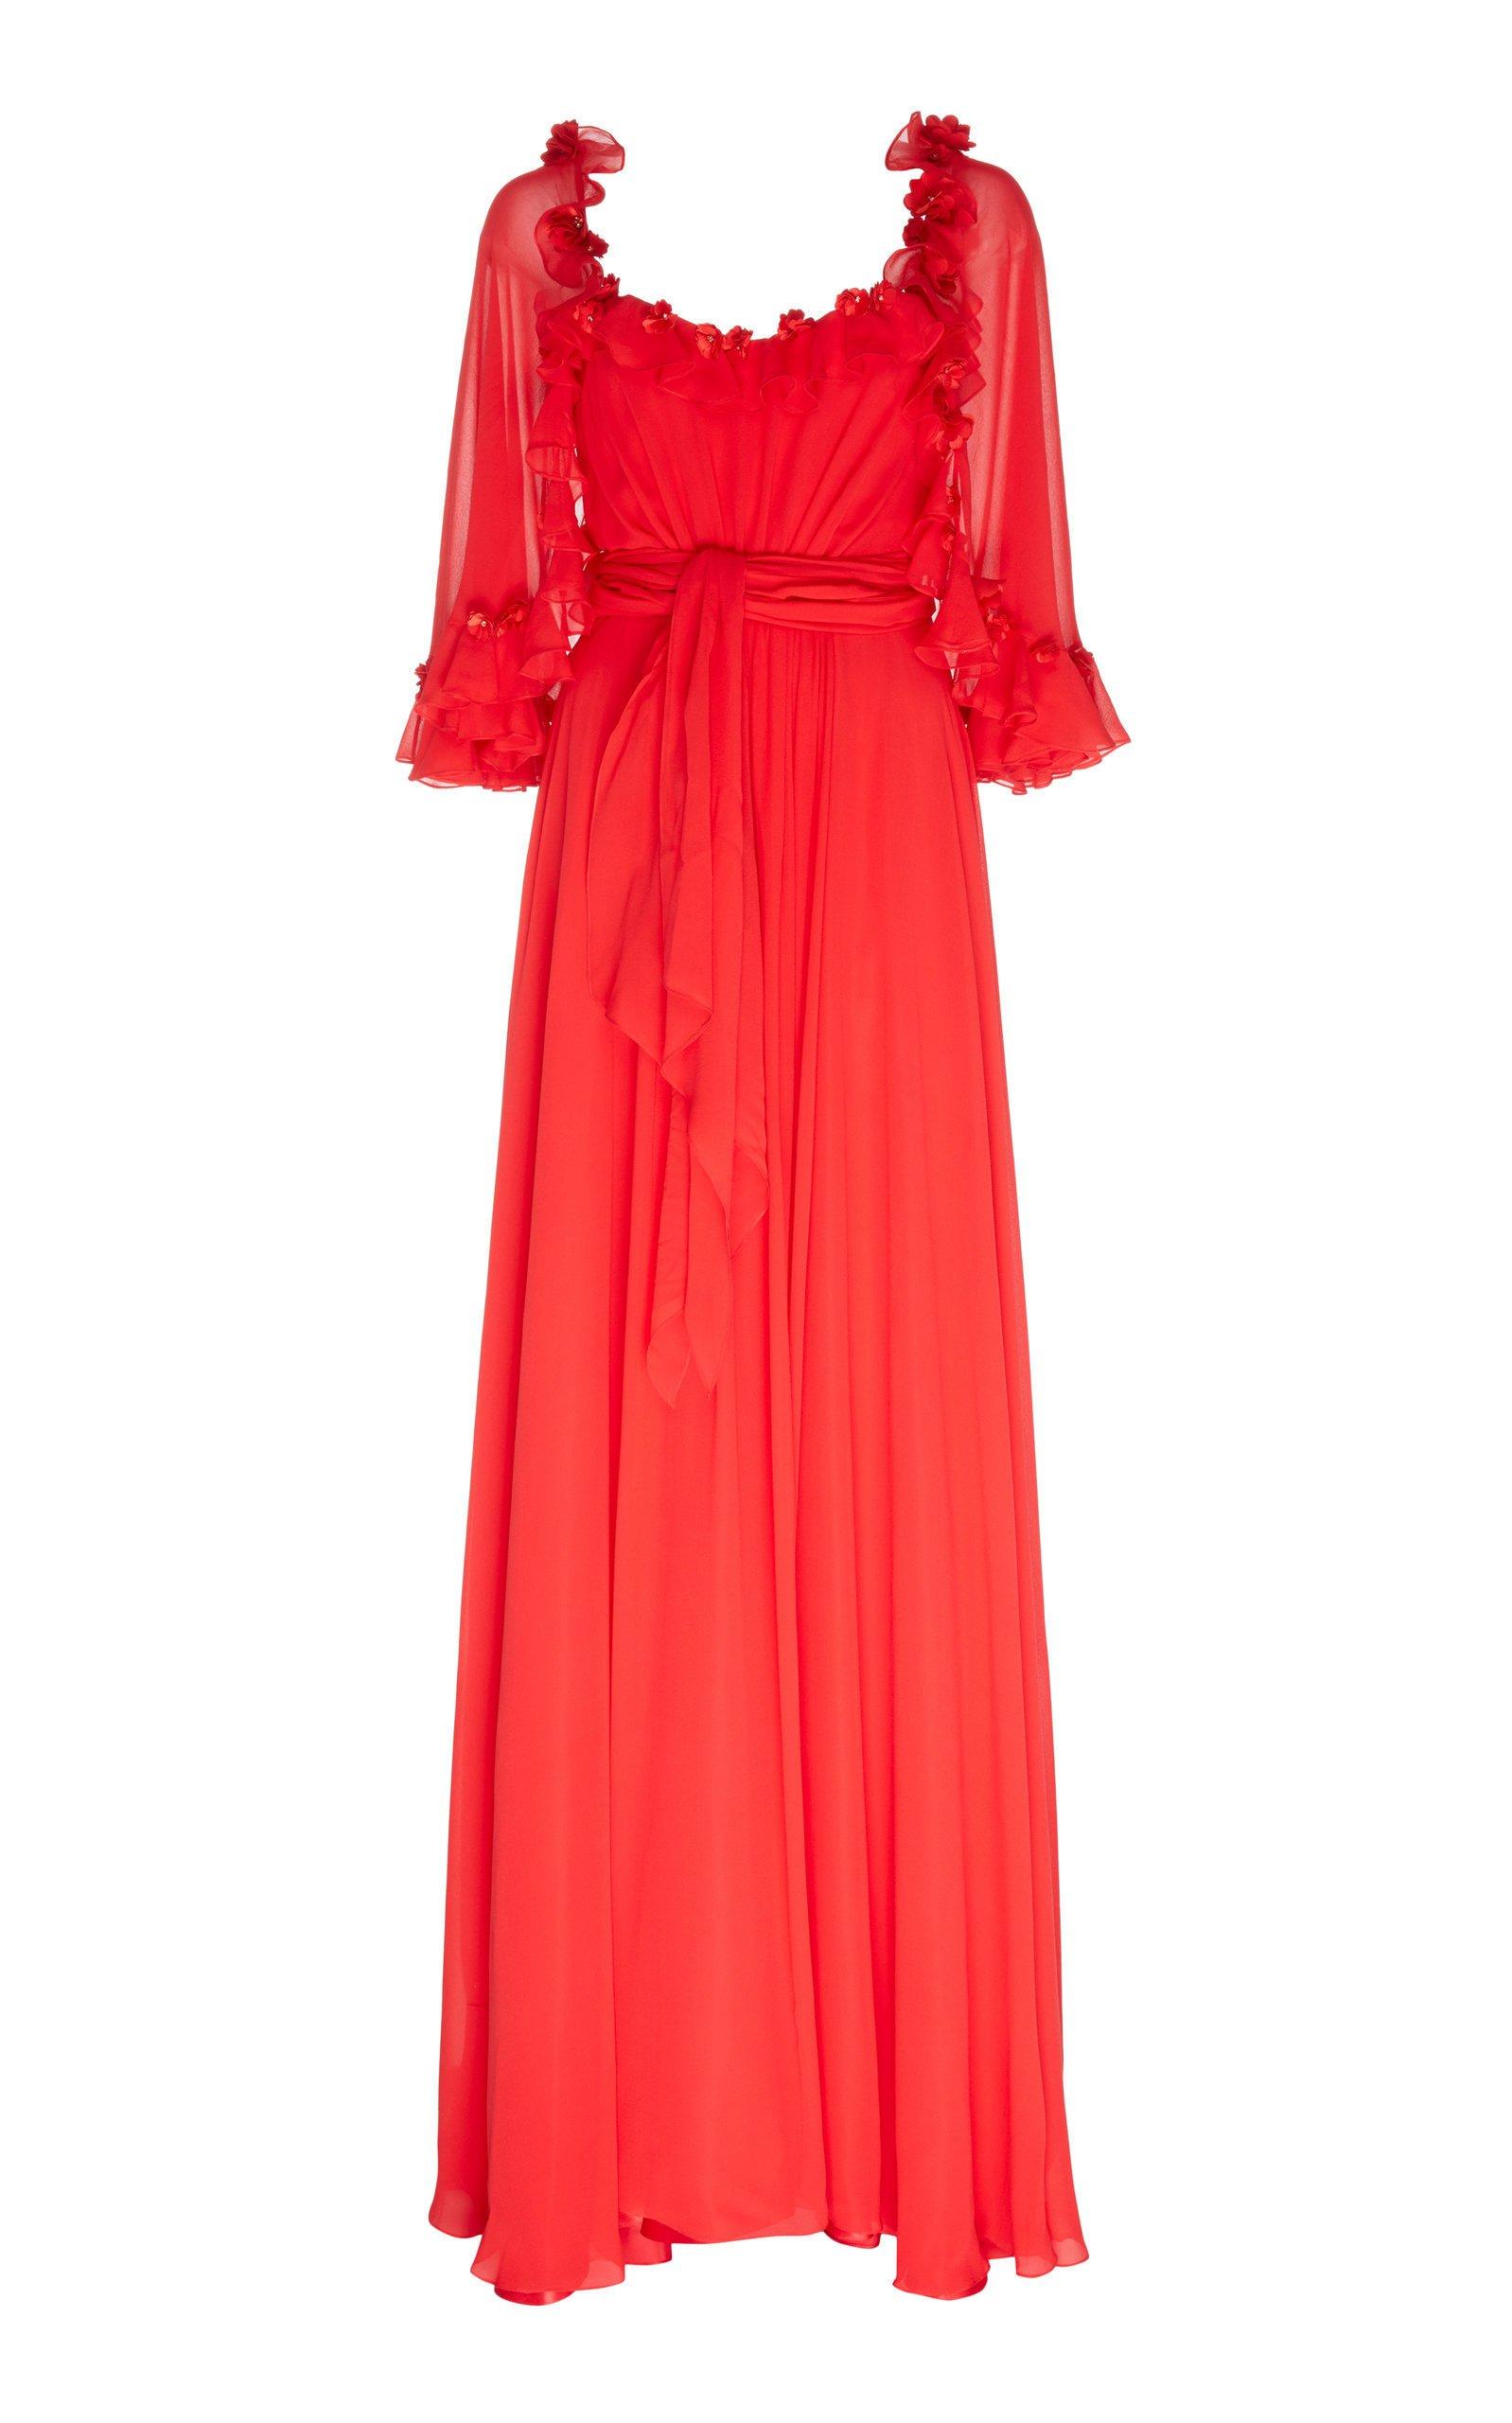 Jenny Packham Adelina Ruffled Chiffon Gown